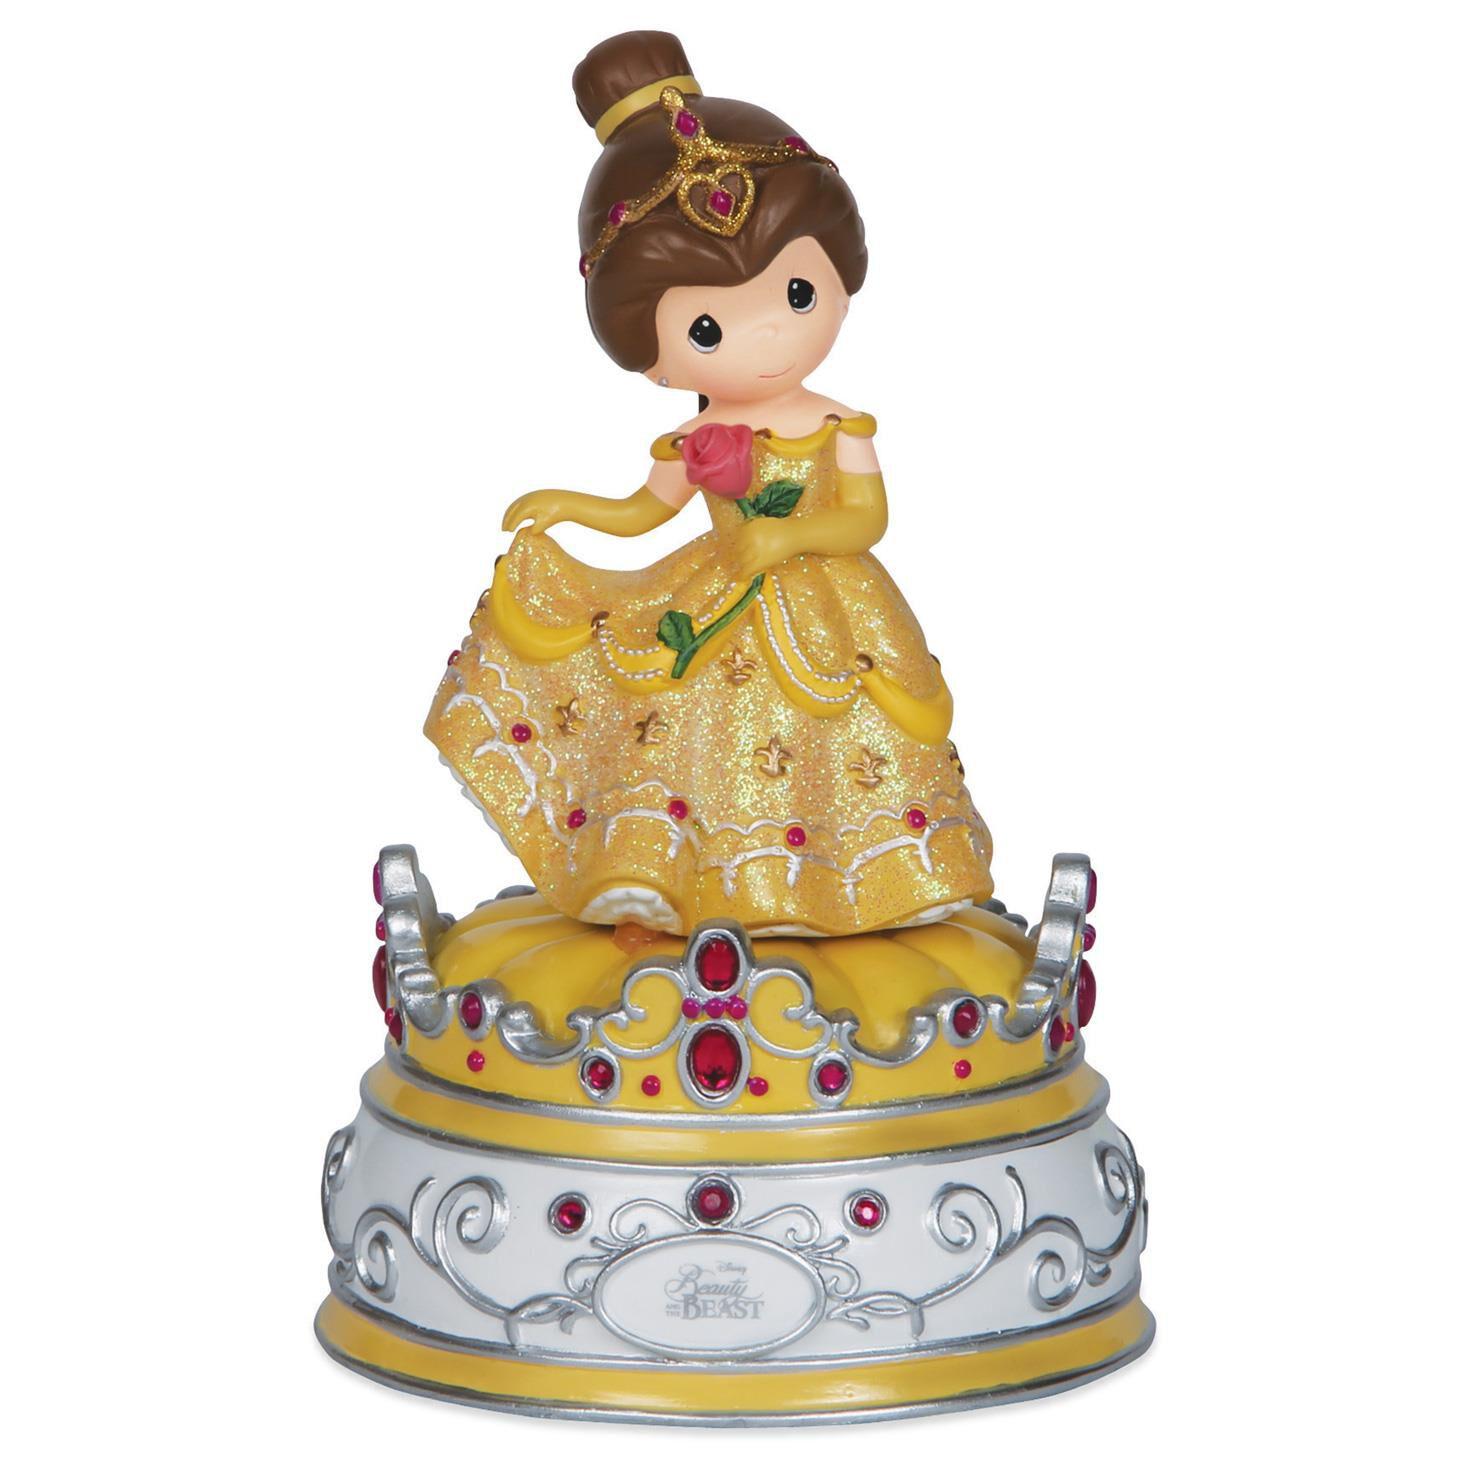 Belle ornament disney - Belle Ornament Disney 26